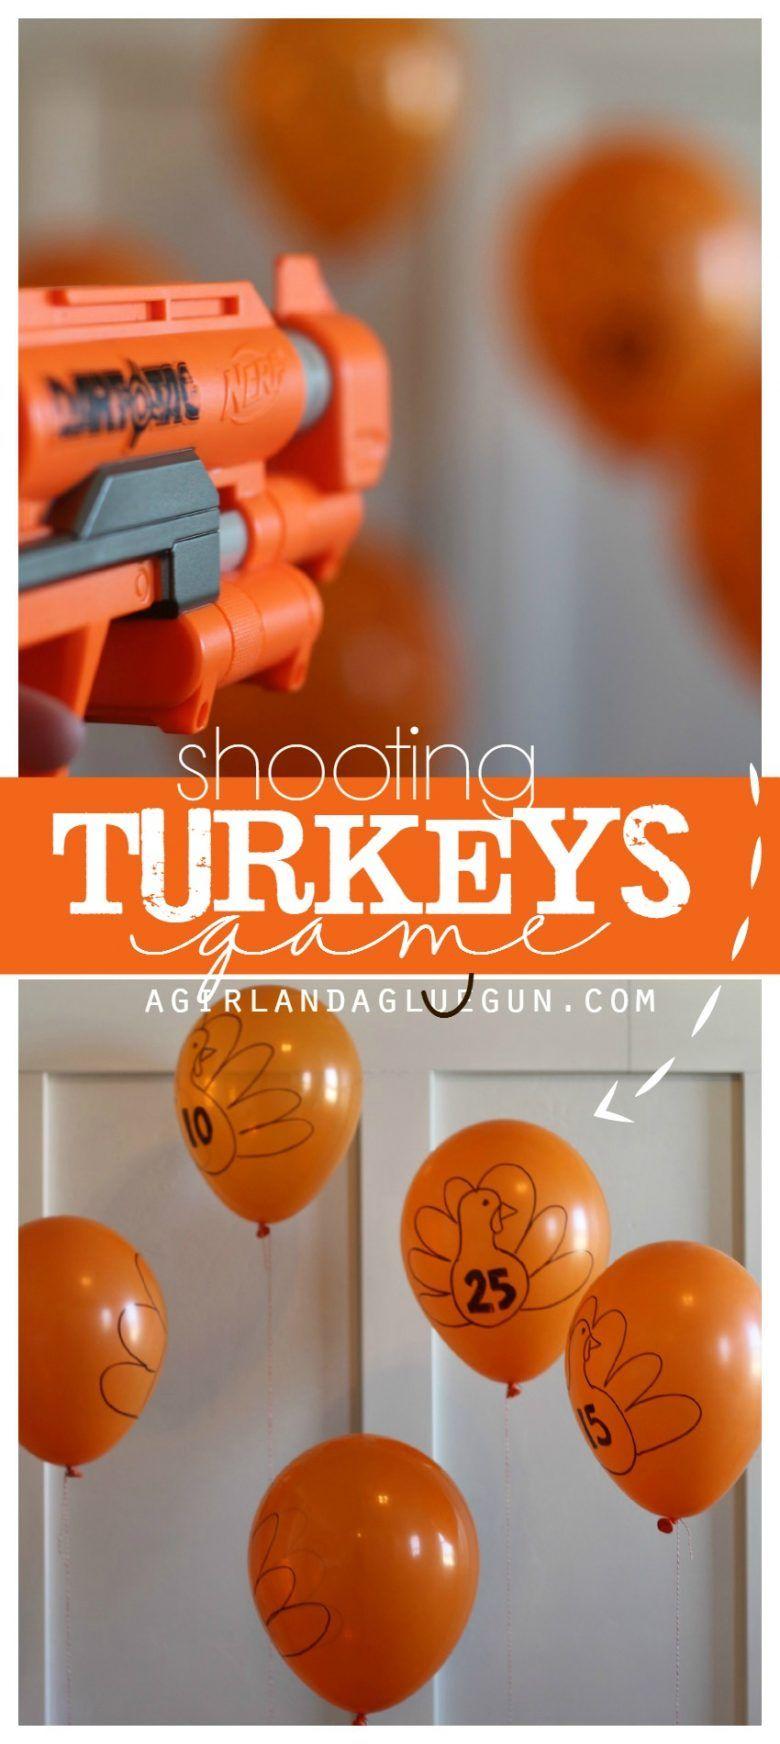 shooting turkeys game! #thanksgivingdecor